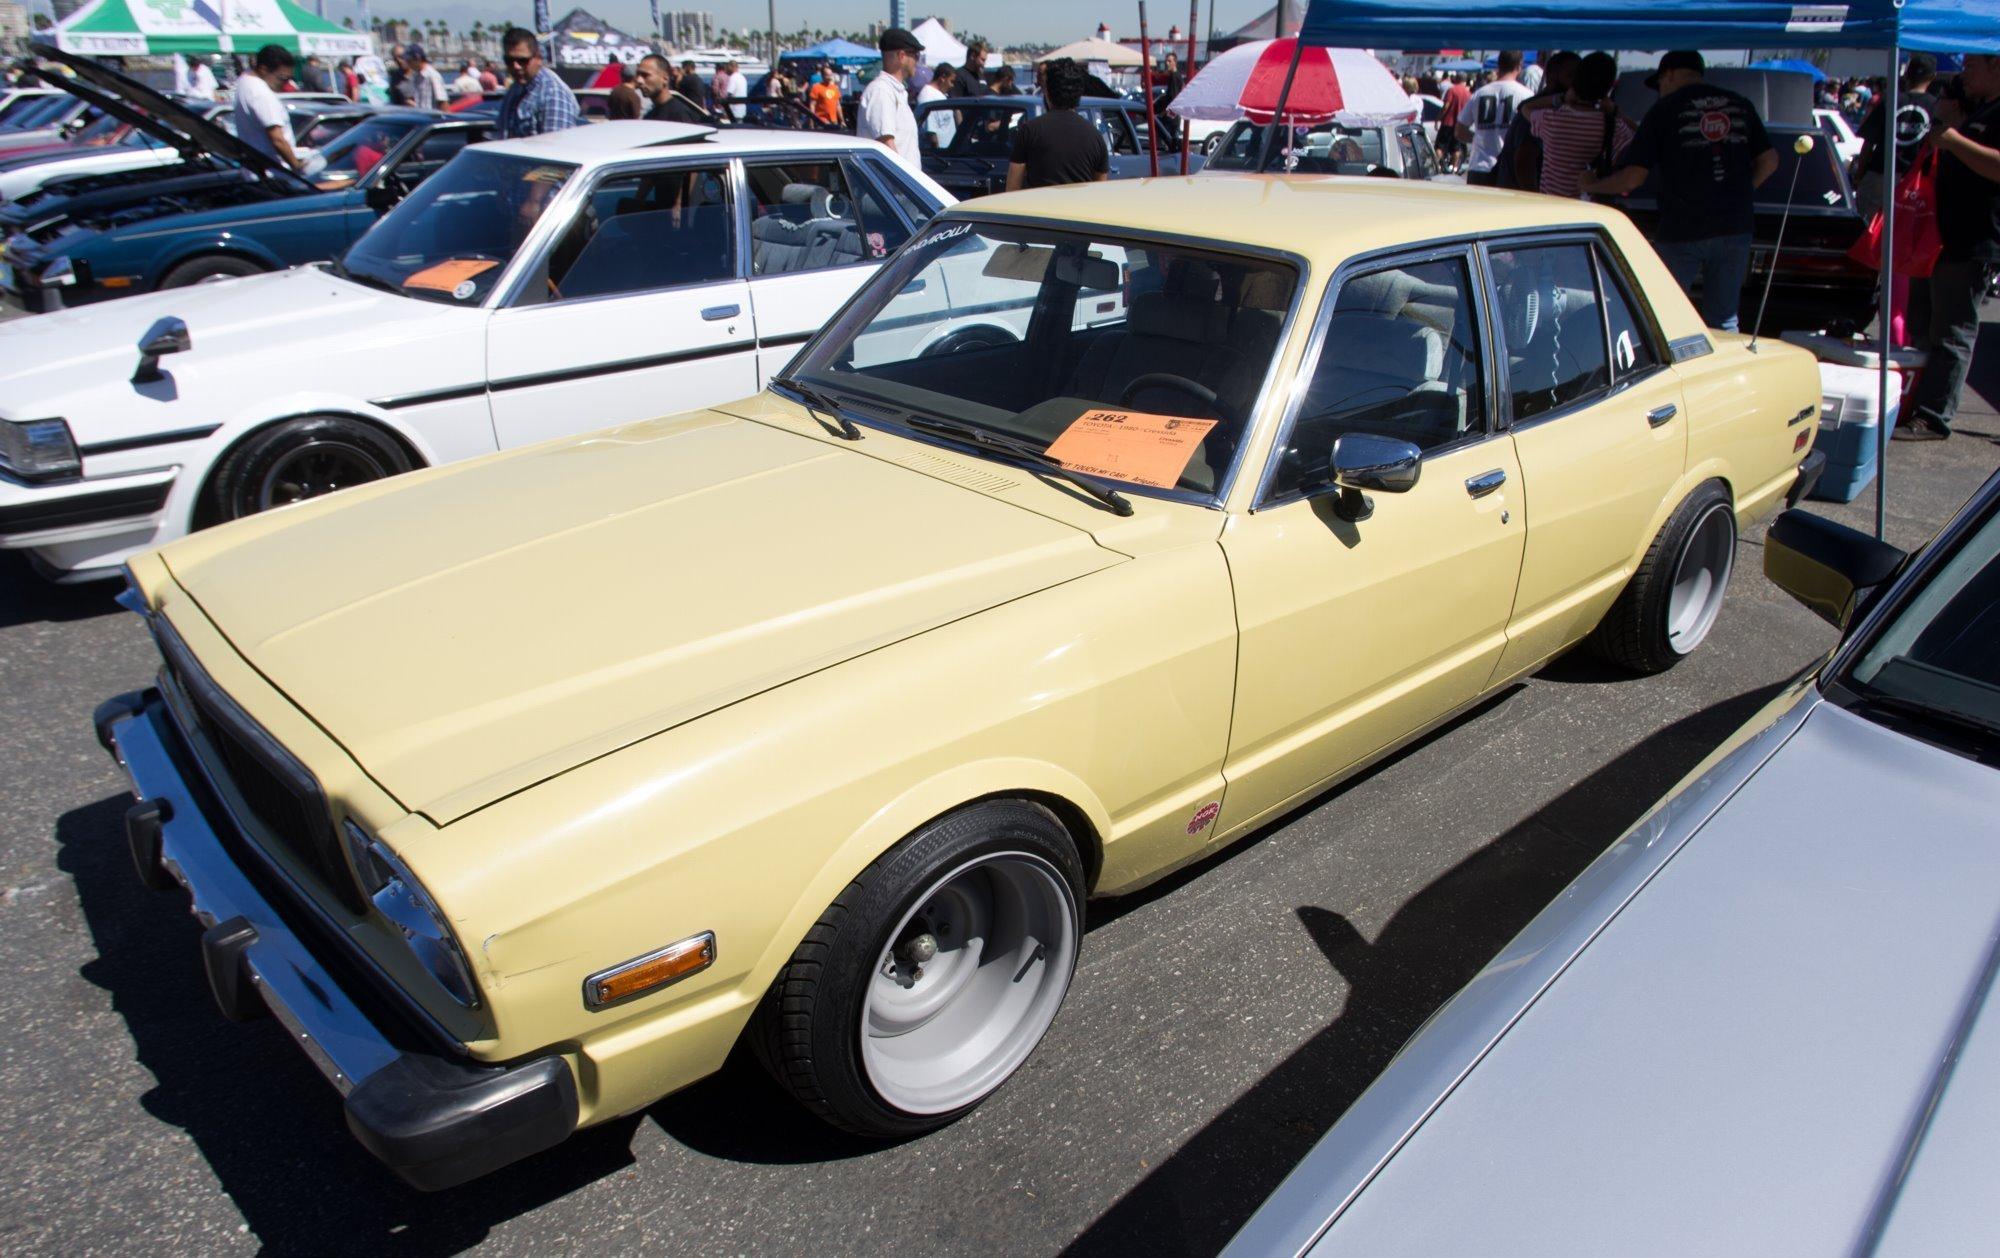 Older Japanese cars - 1 - PentaxForums.com